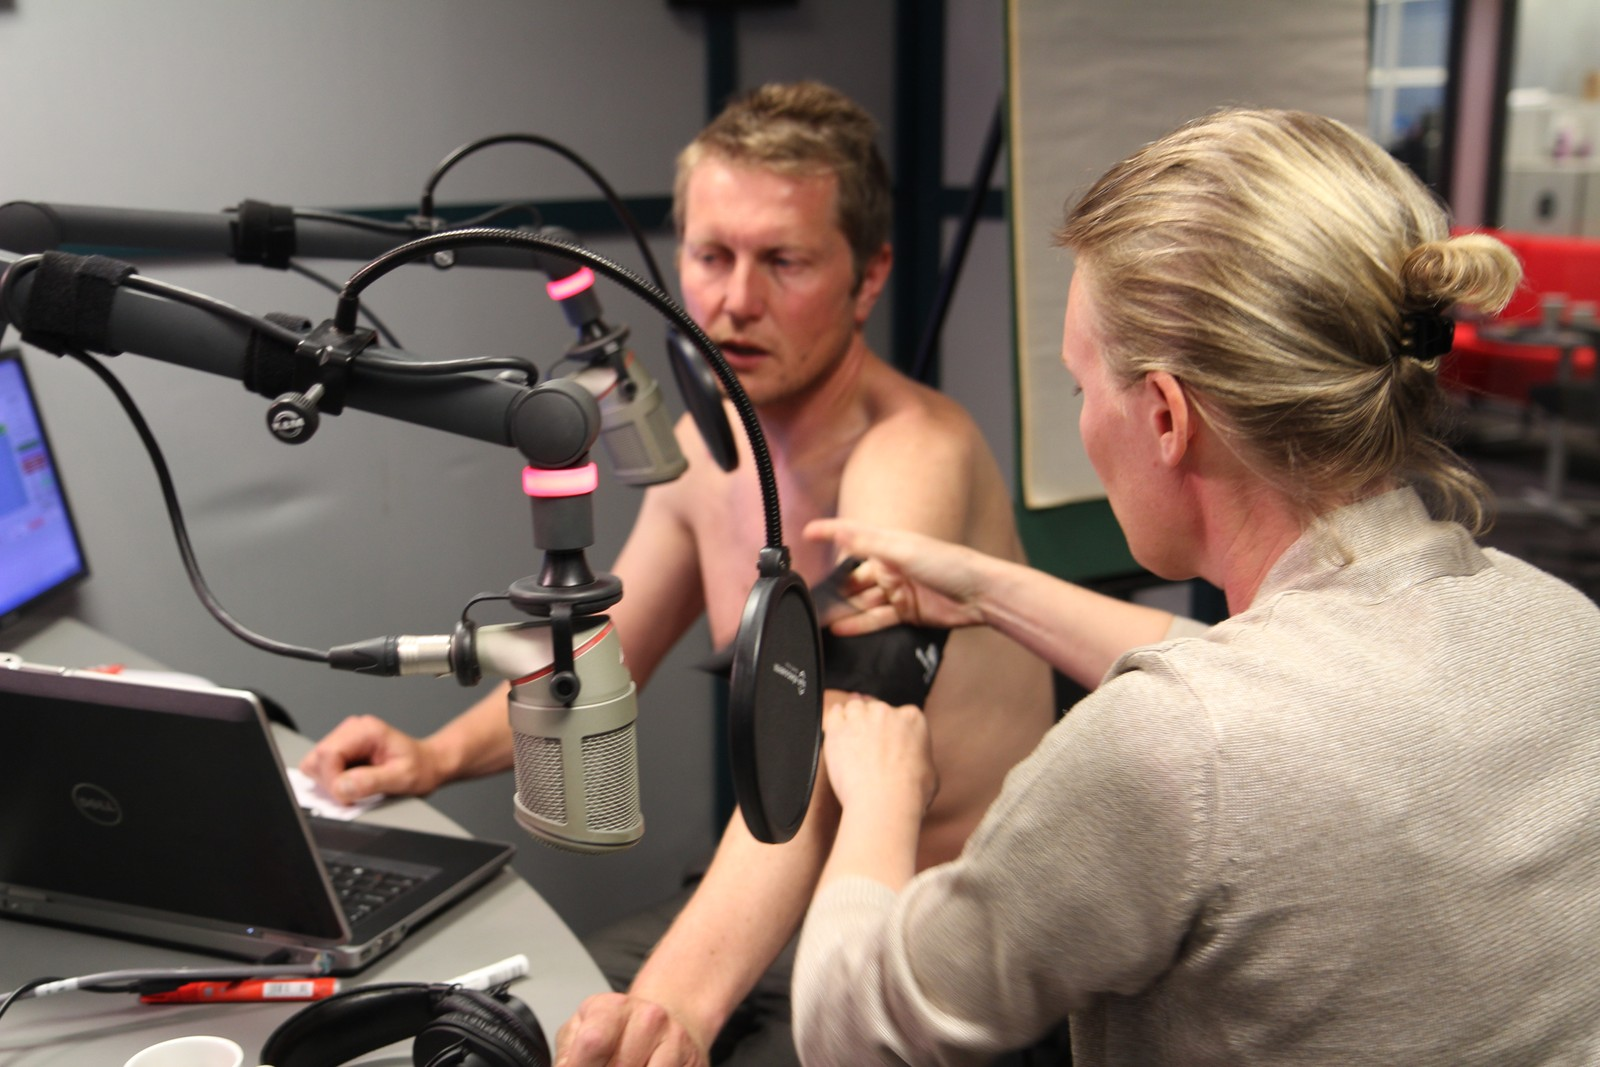 Fylkeslege Janne Dahle-Melhus sjekker helsetilstanden til programleder Johan Mihle Laugaland etter flere timer på lufta.